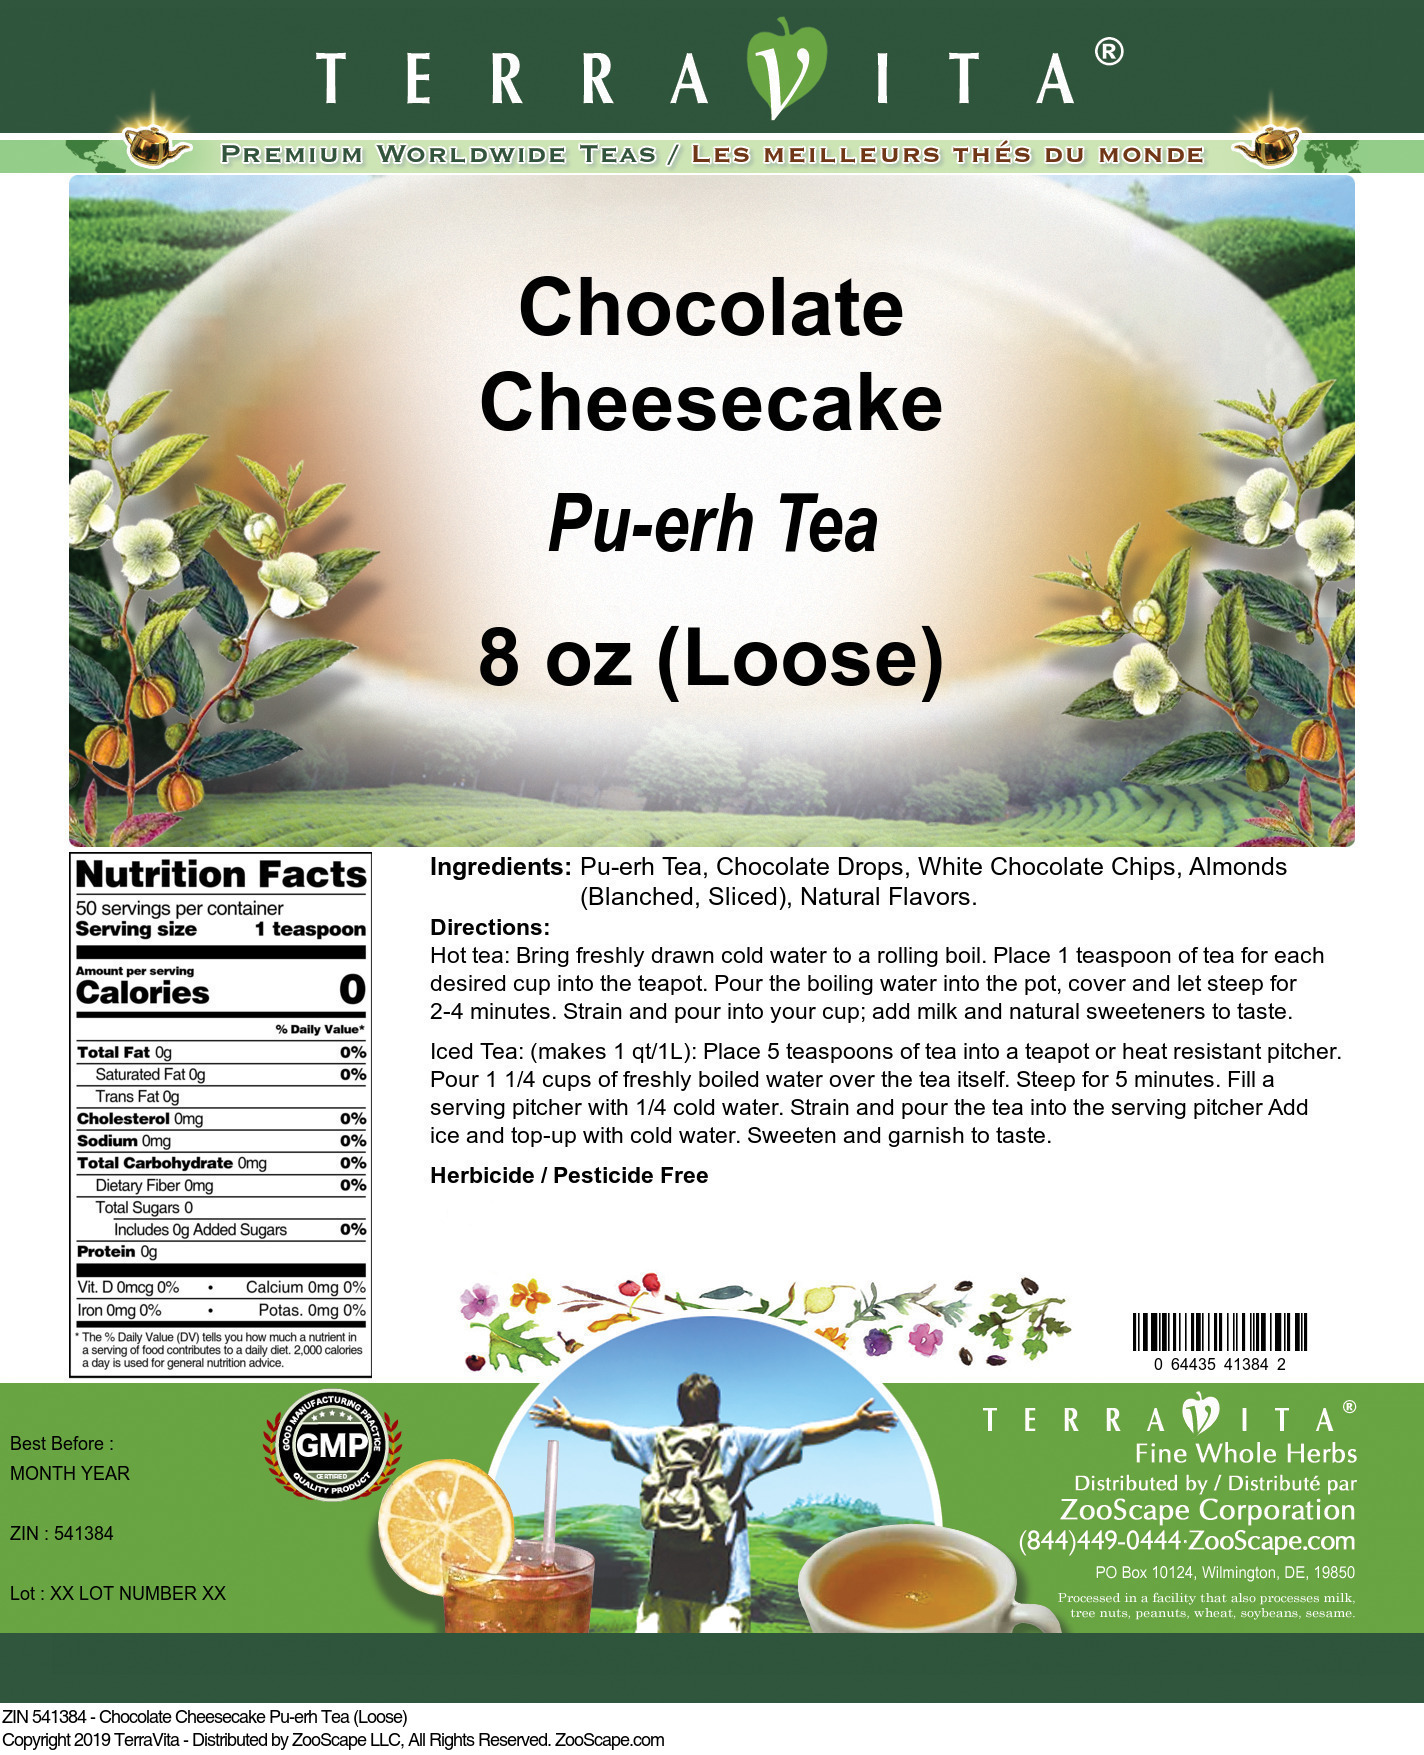 Chocolate Cheesecake Pu-erh Tea (Loose)